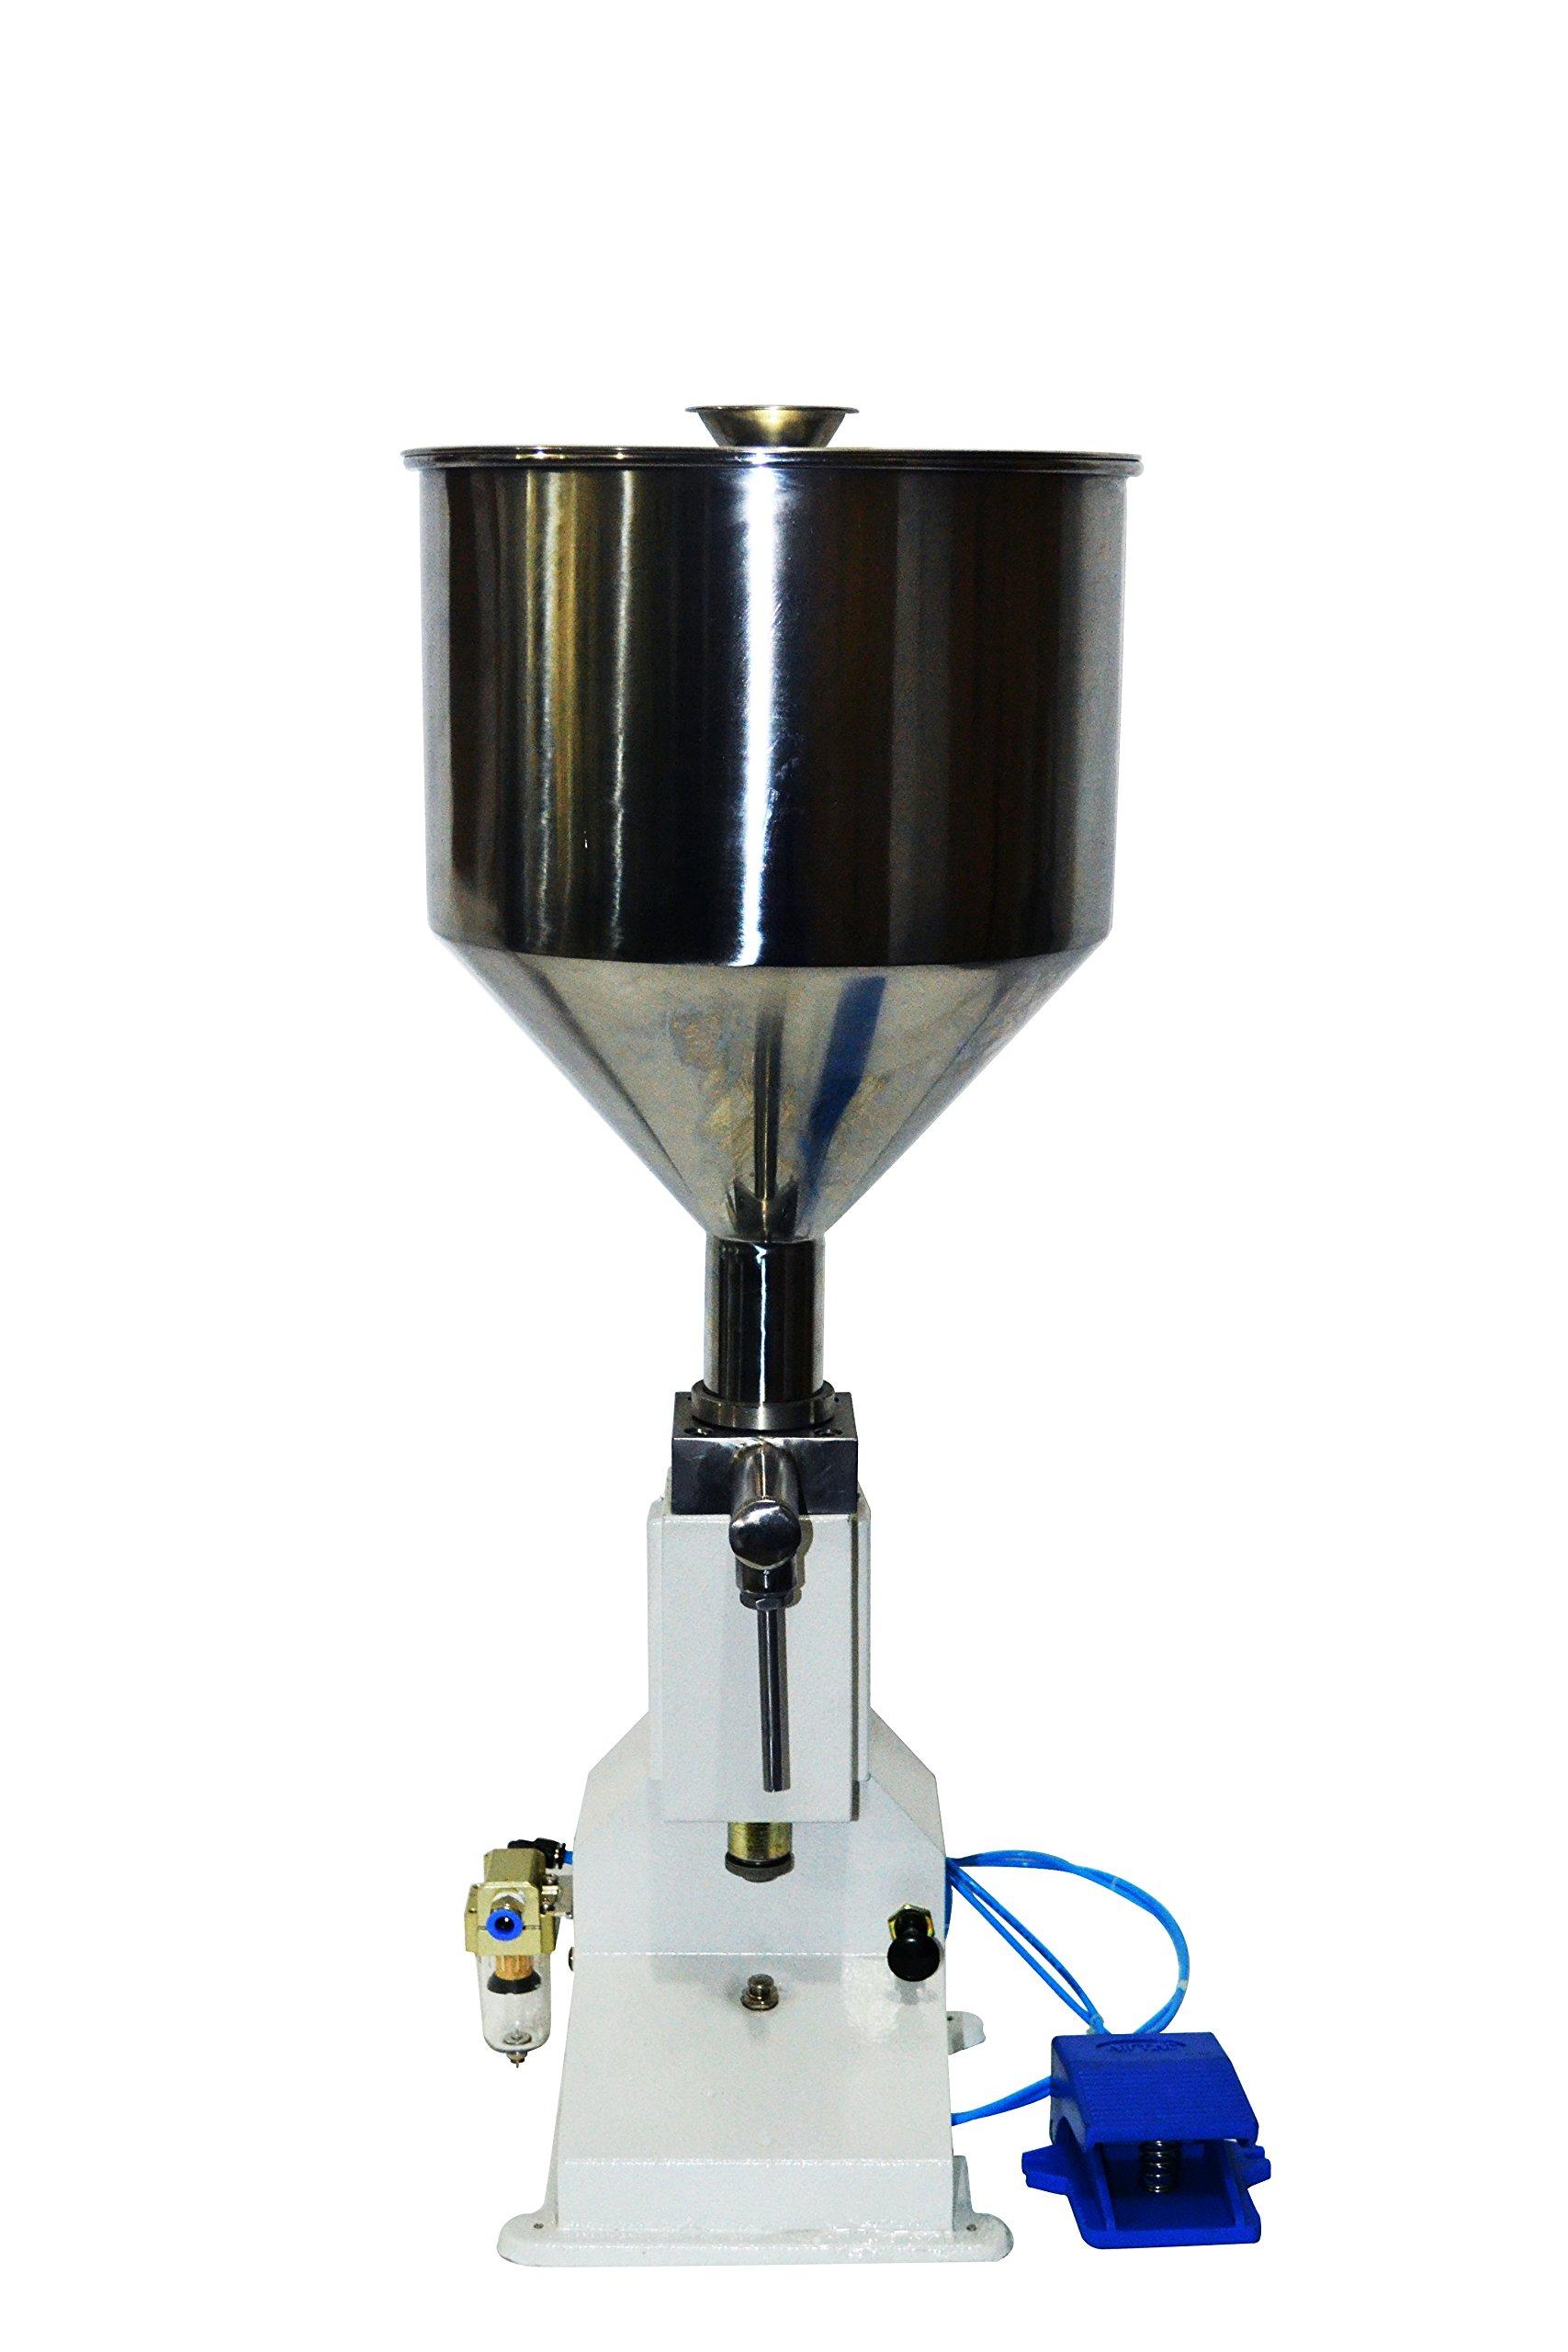 A02 Pneumatic Liquid Paste Filling Machine 5~50ml Liquid Filling Machine for Cream Shampoo Cosmetic(A02)